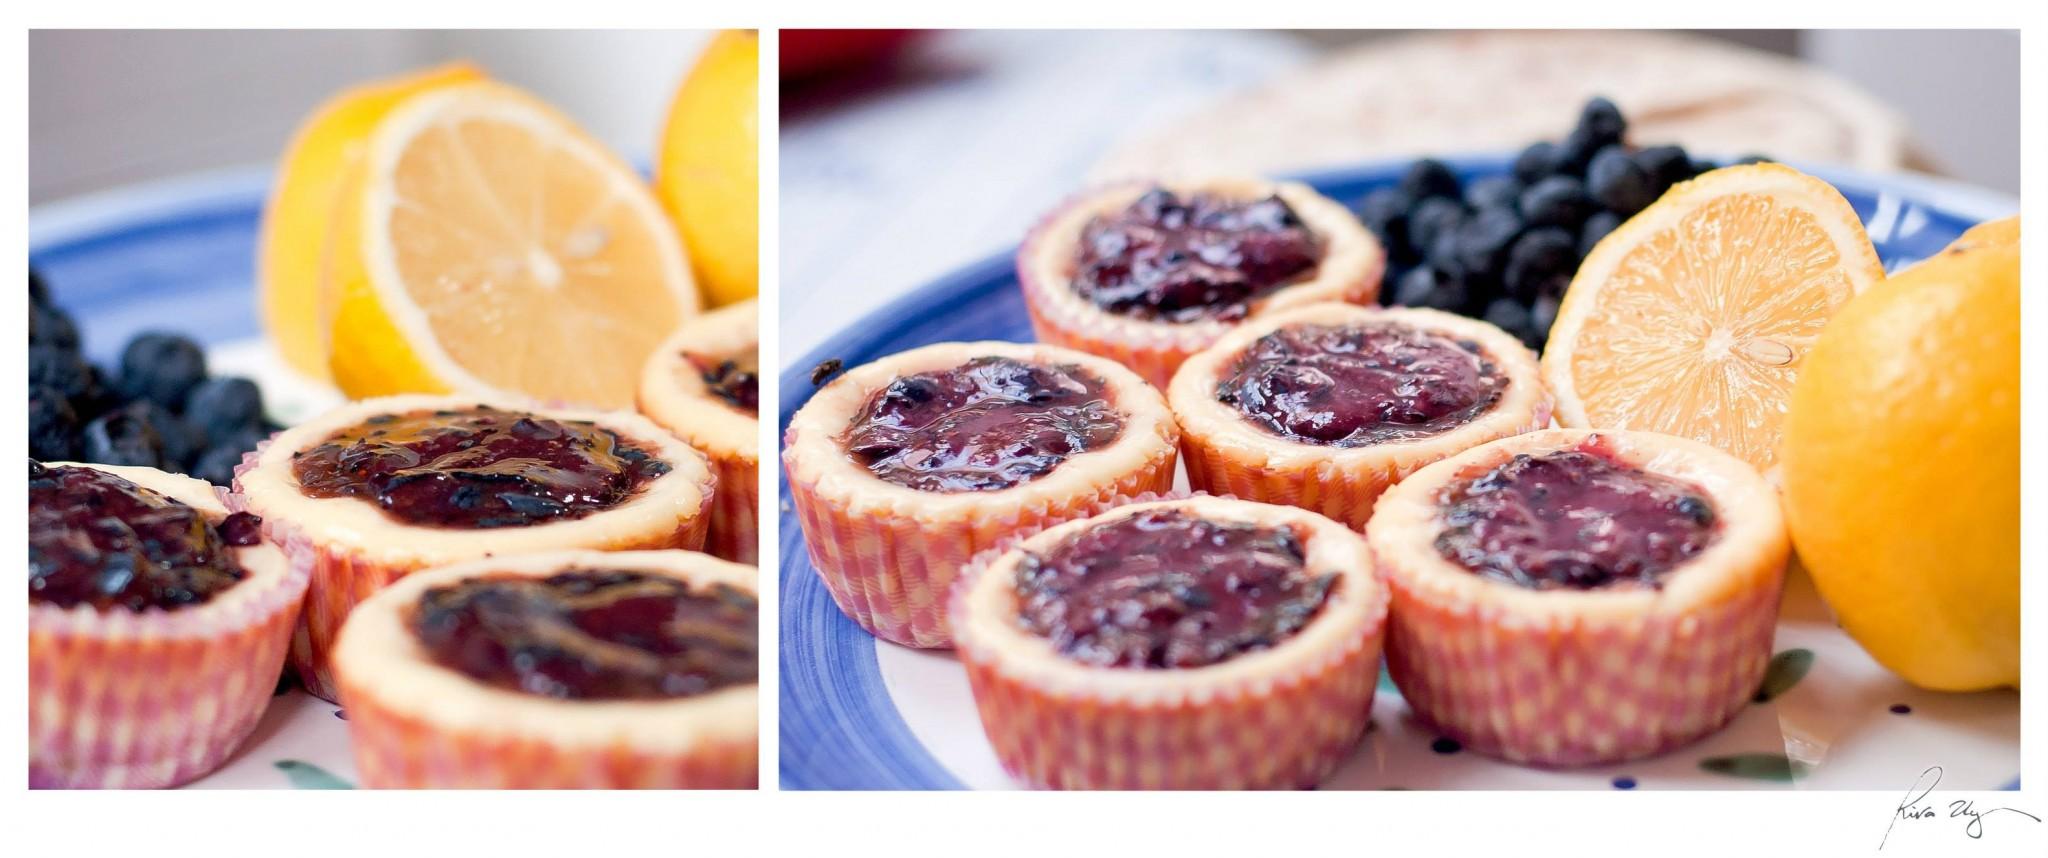 Riva Loren Uy - Food Photography